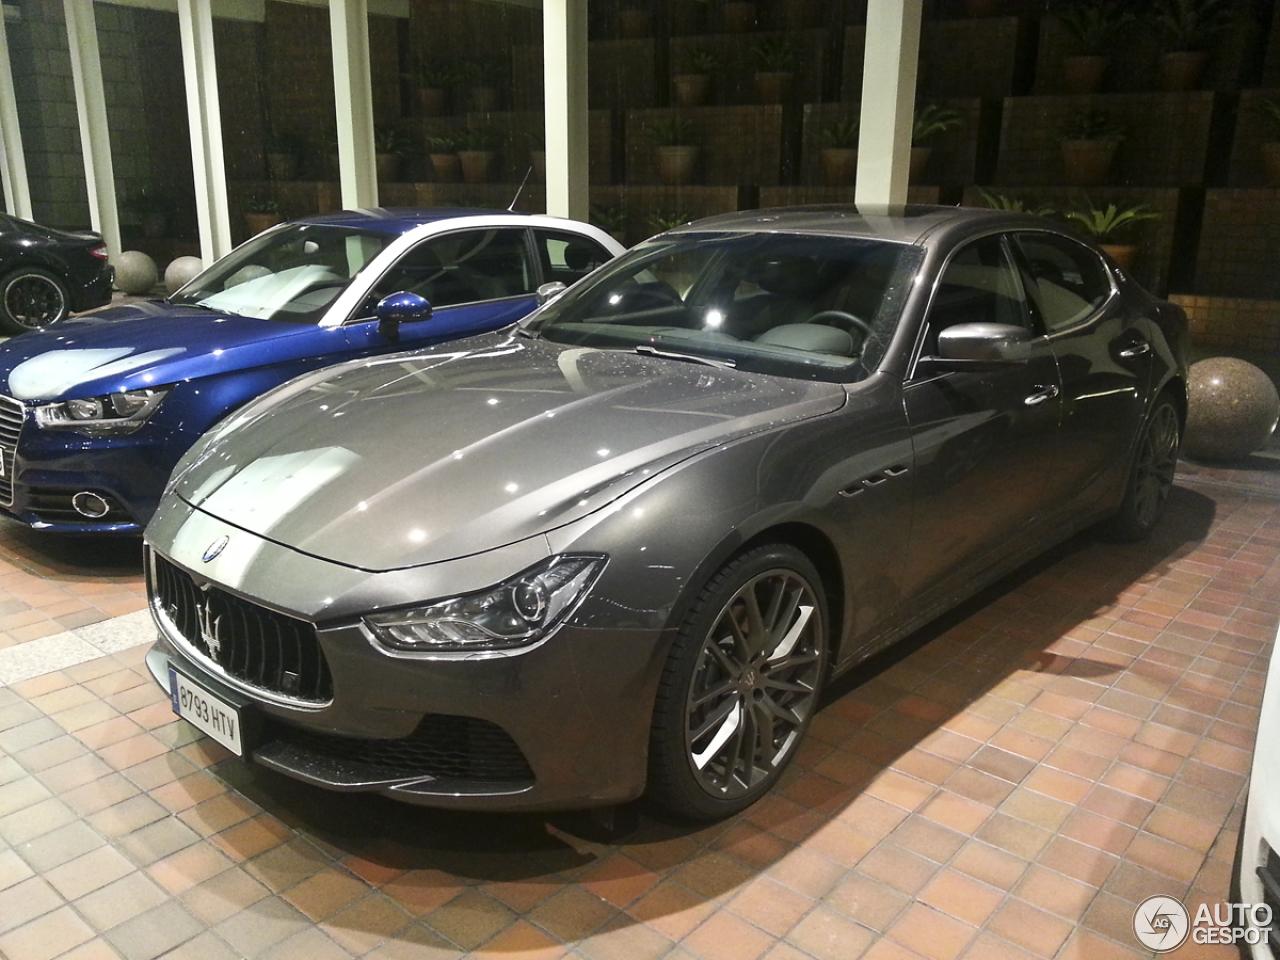 Maserati Ghibli 2013 21 December 2013 Autogespot